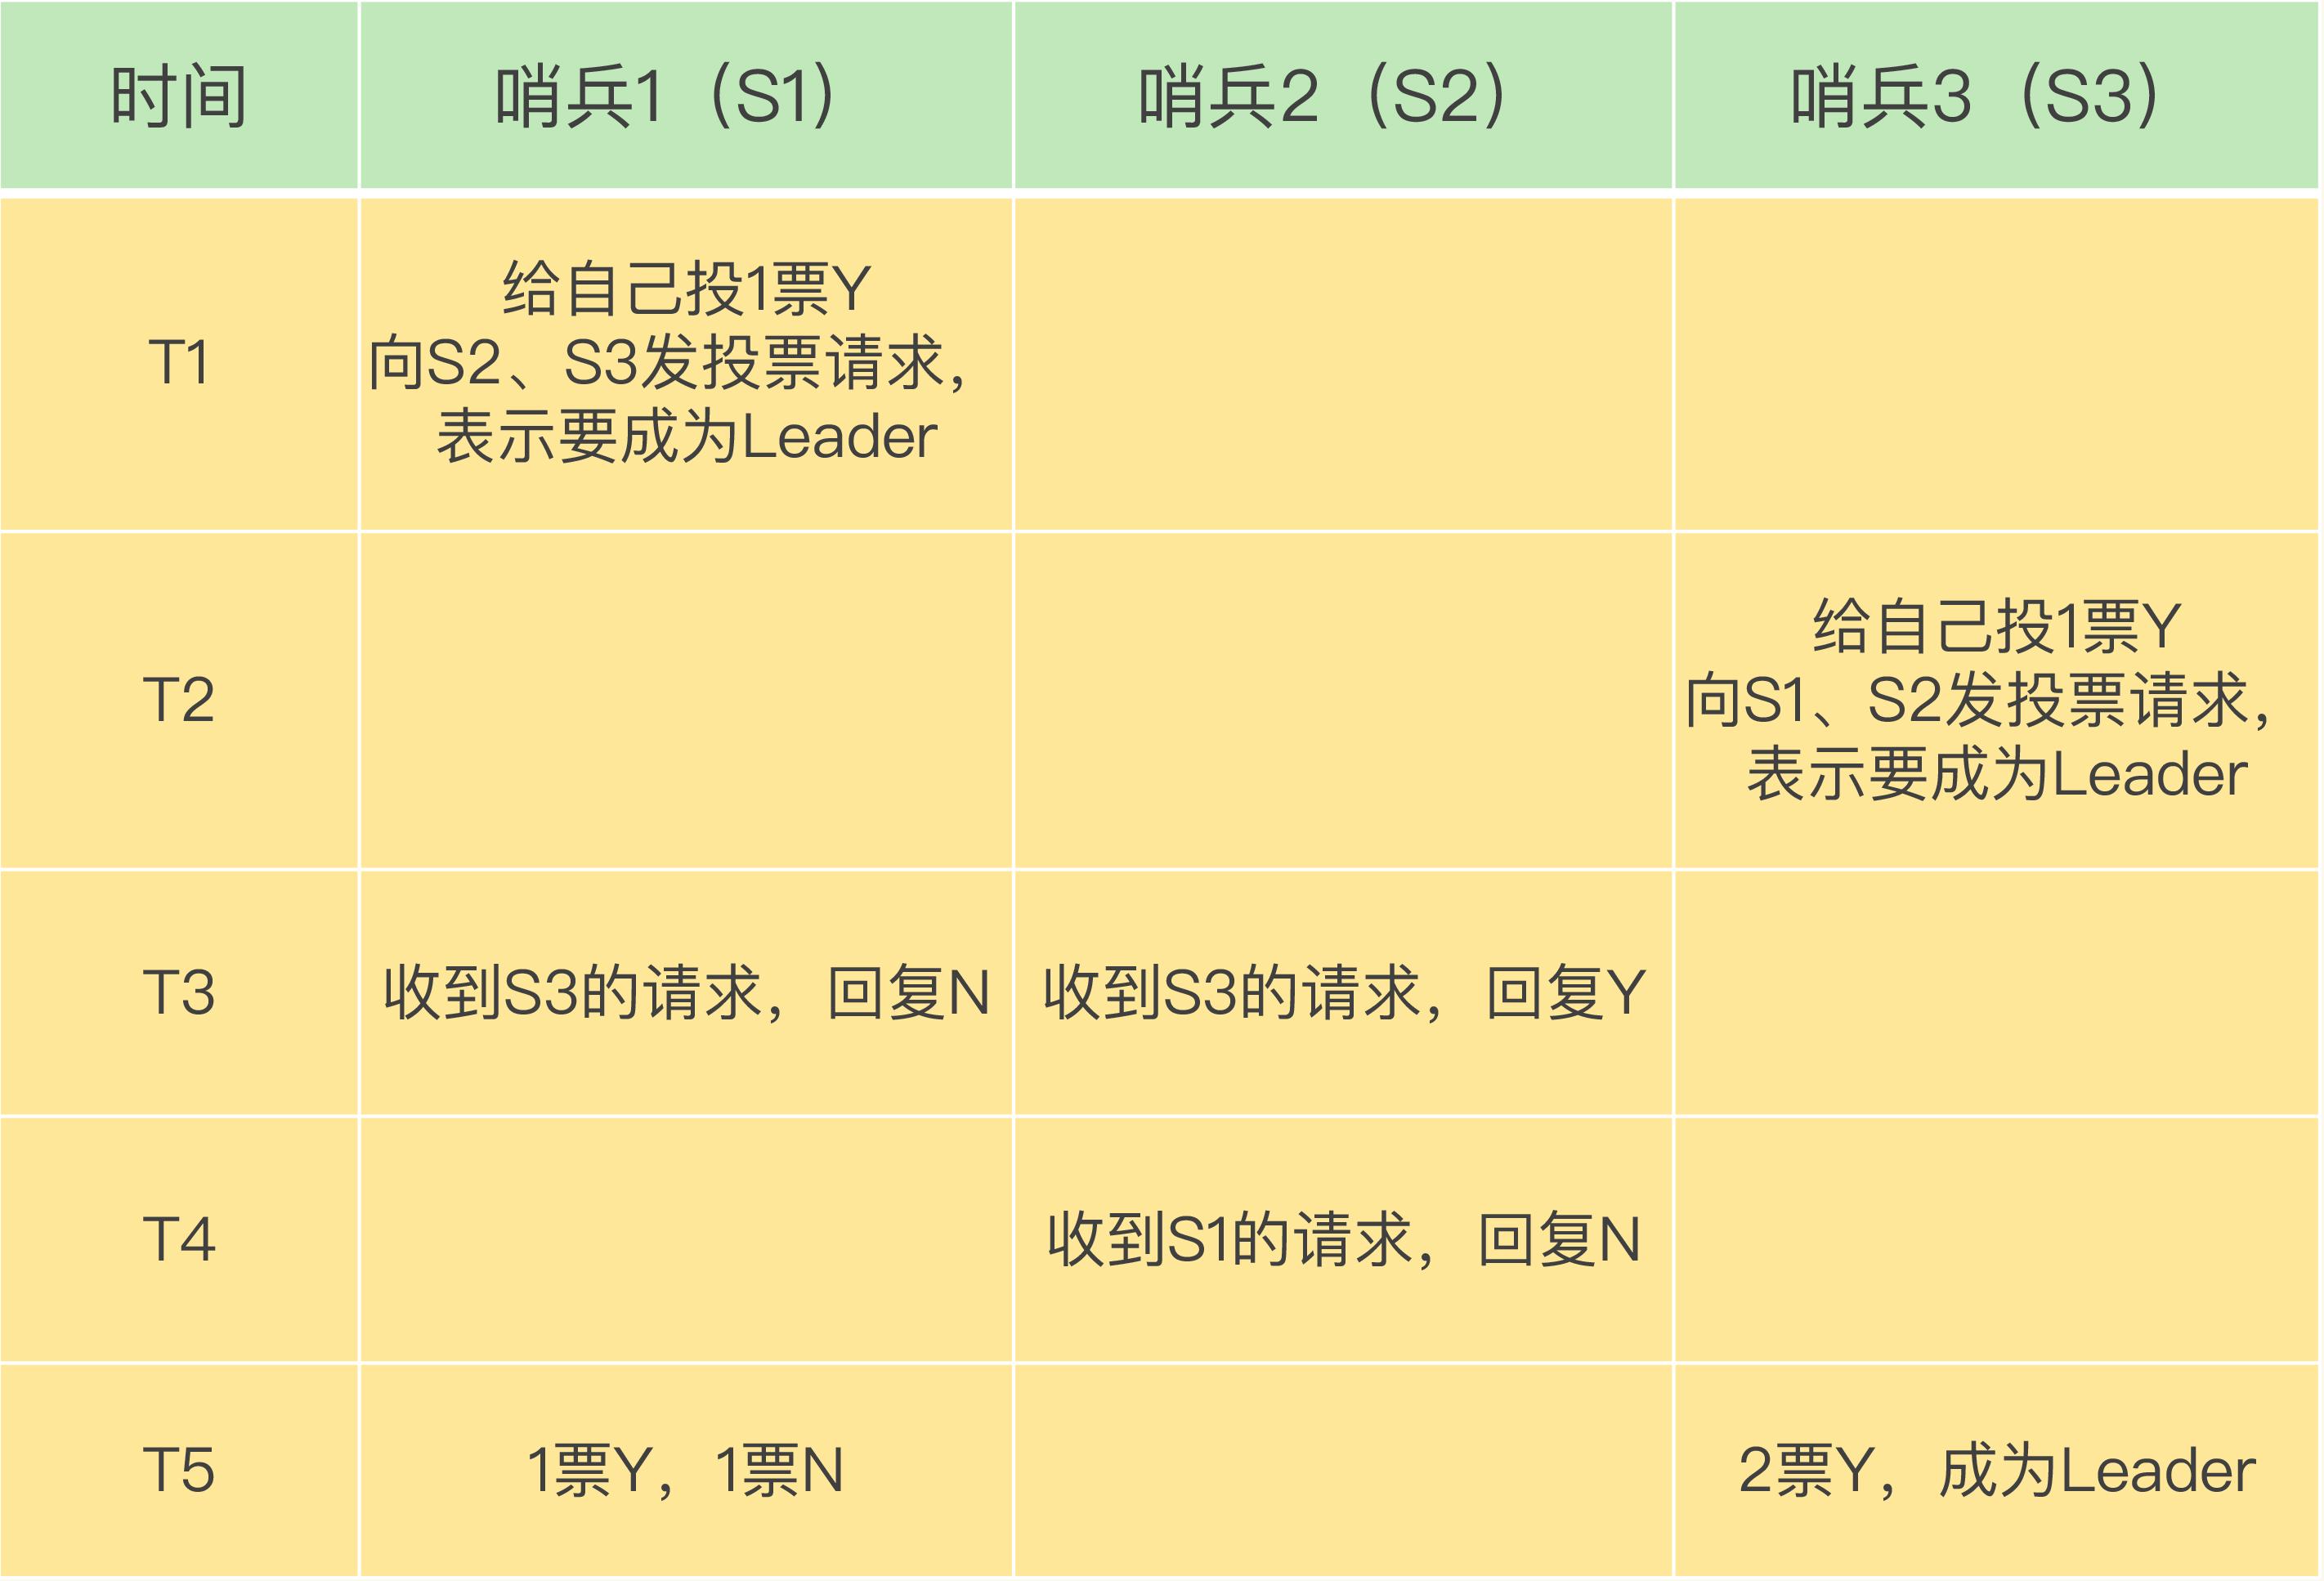 Redis%E5%9F%BA%E7%A1%80%2014228084dd94451f866e44377bc9cb0d/Untitled%2025.png